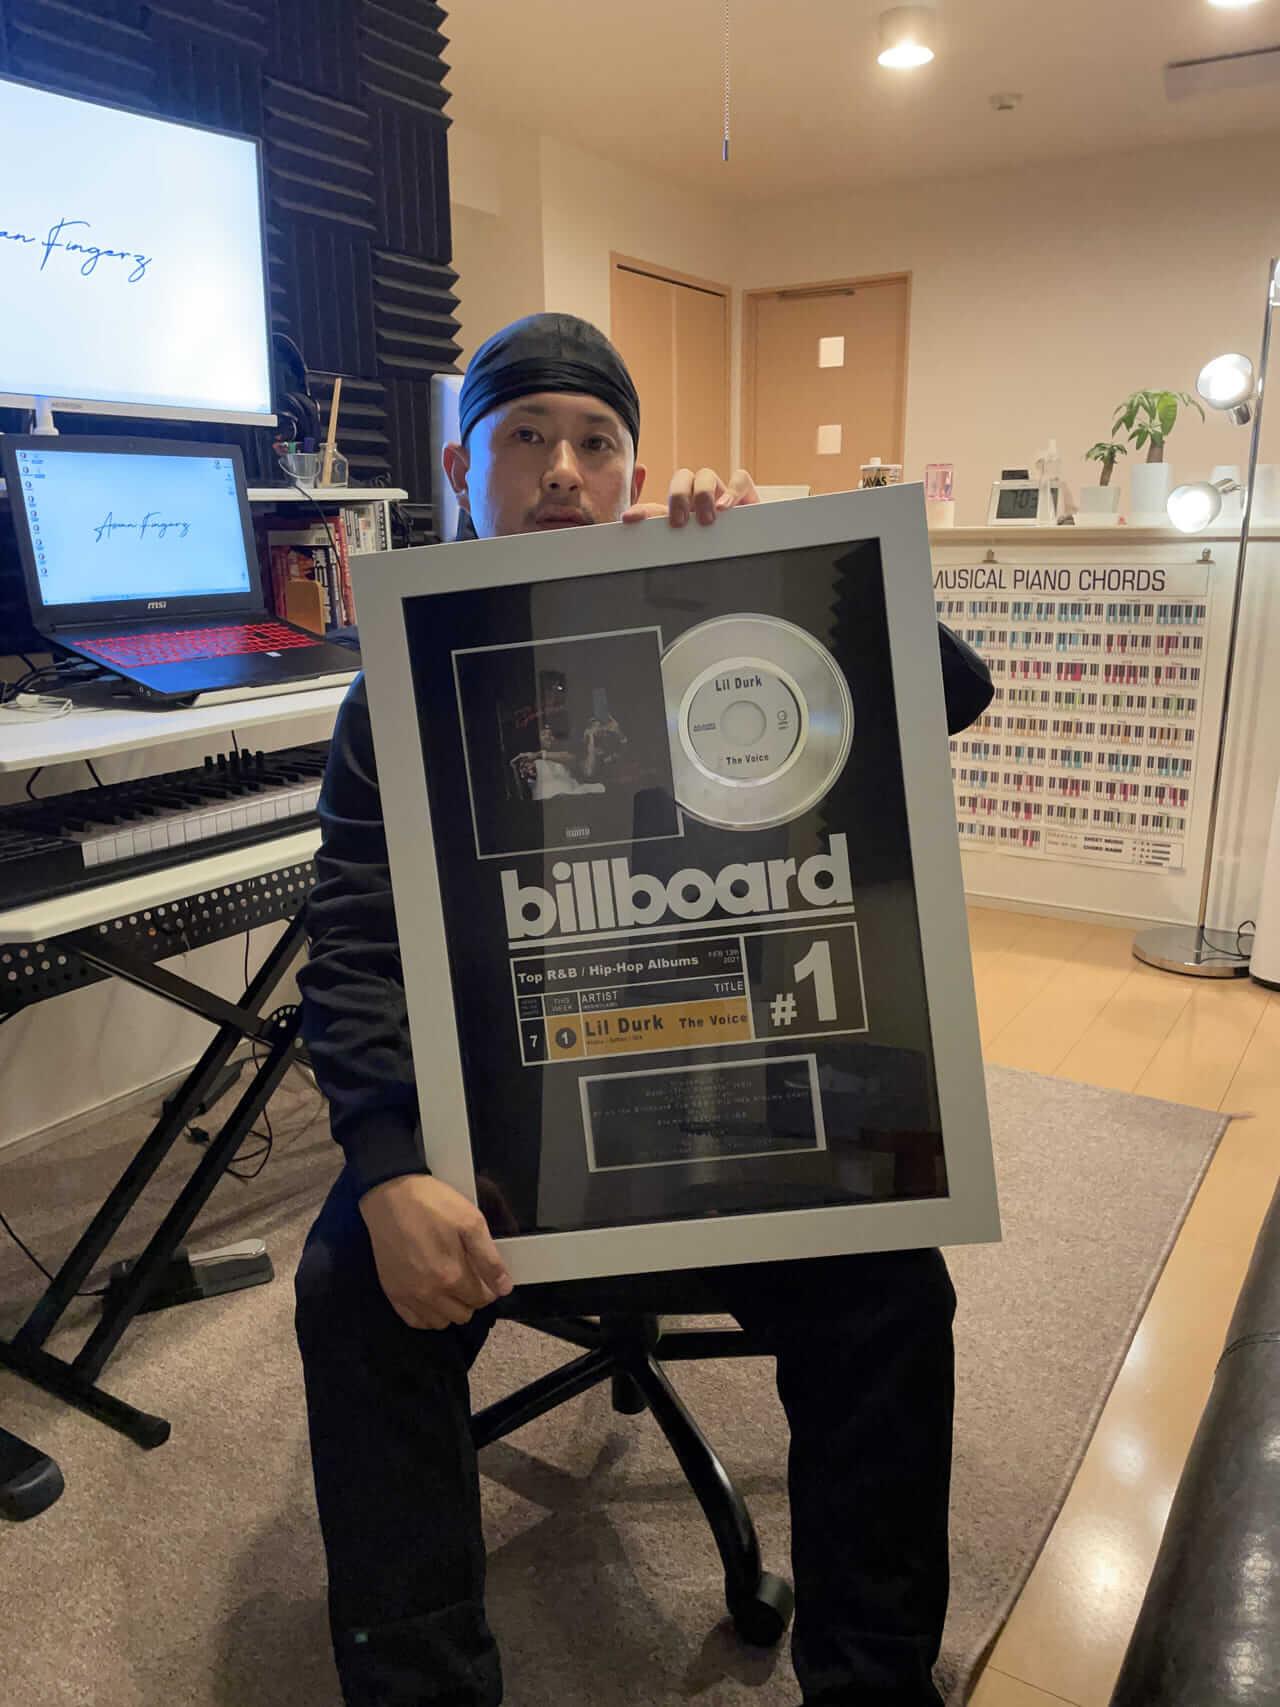 TRILL DYNASTY インタビュー | 日本人プロデューサーとして全米ビルボード1位の快挙